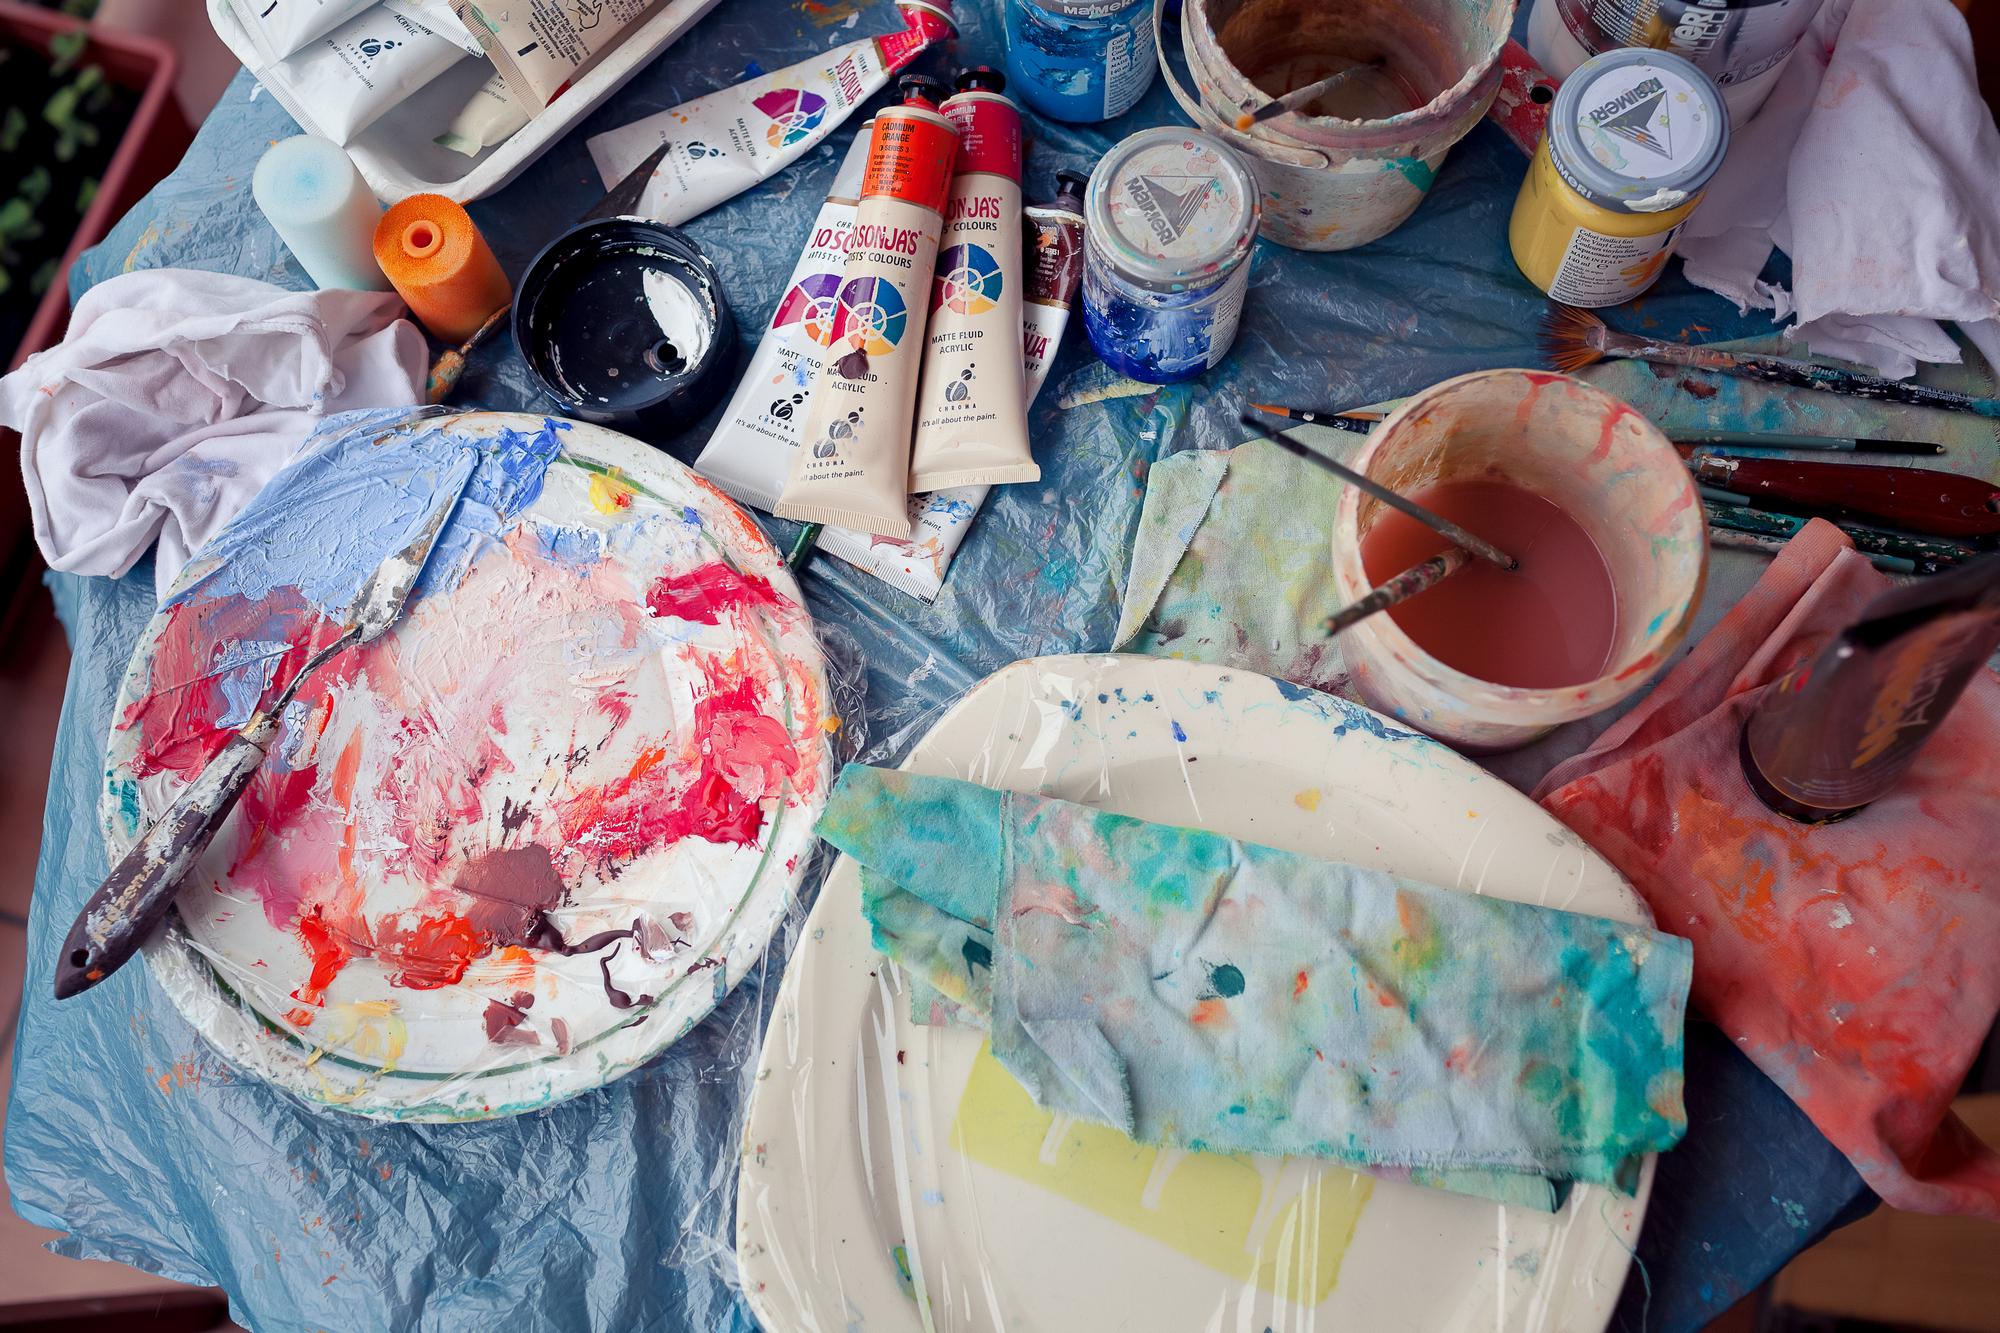 Warsztat pracy malarki